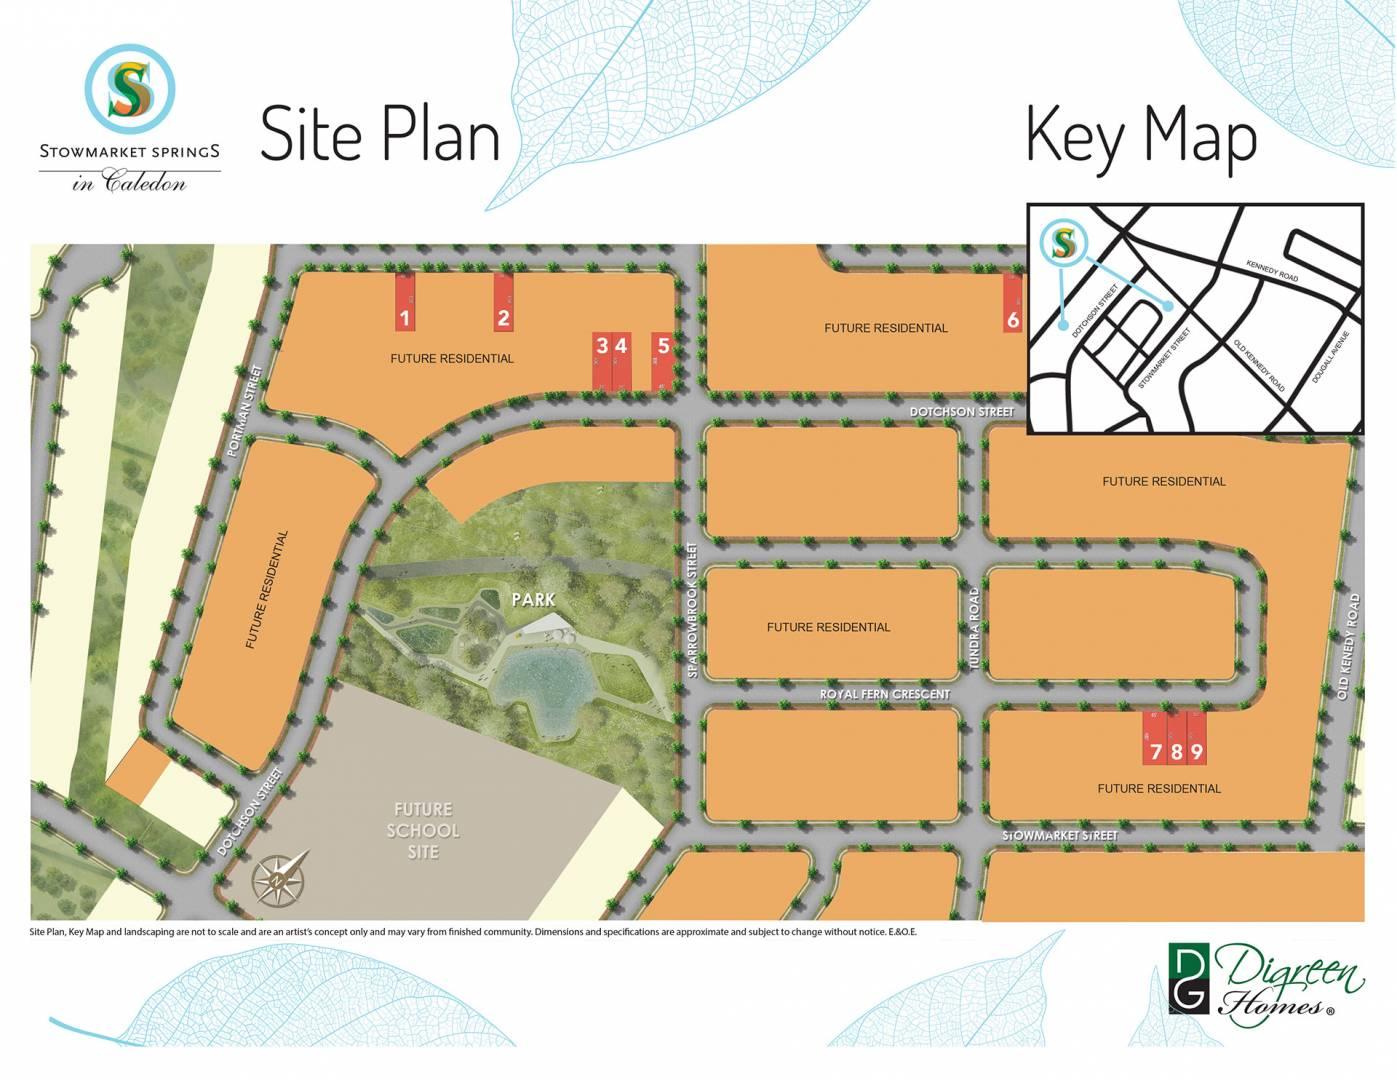 Stowmarket Springs Site Plan